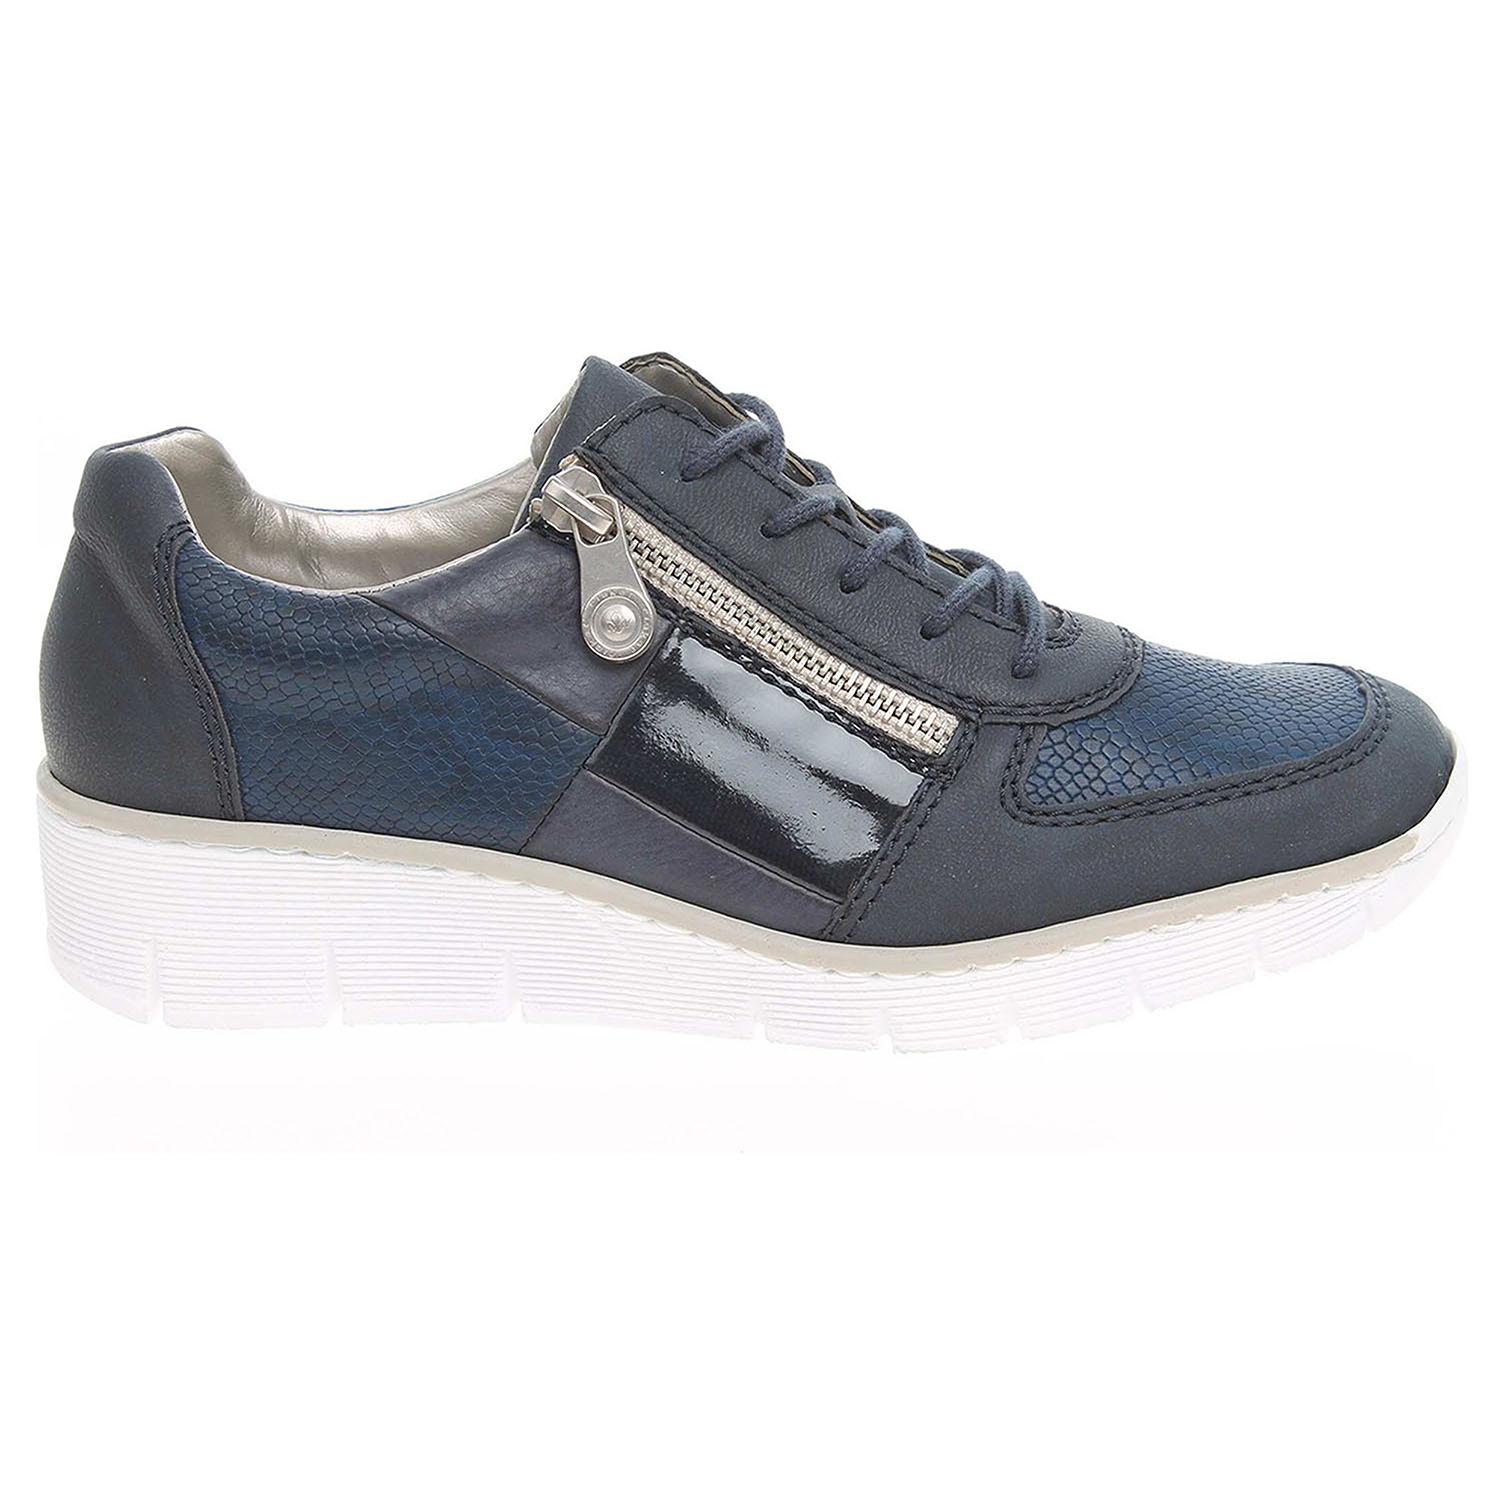 Rieker dámská obuv 53714-14 modrá 42